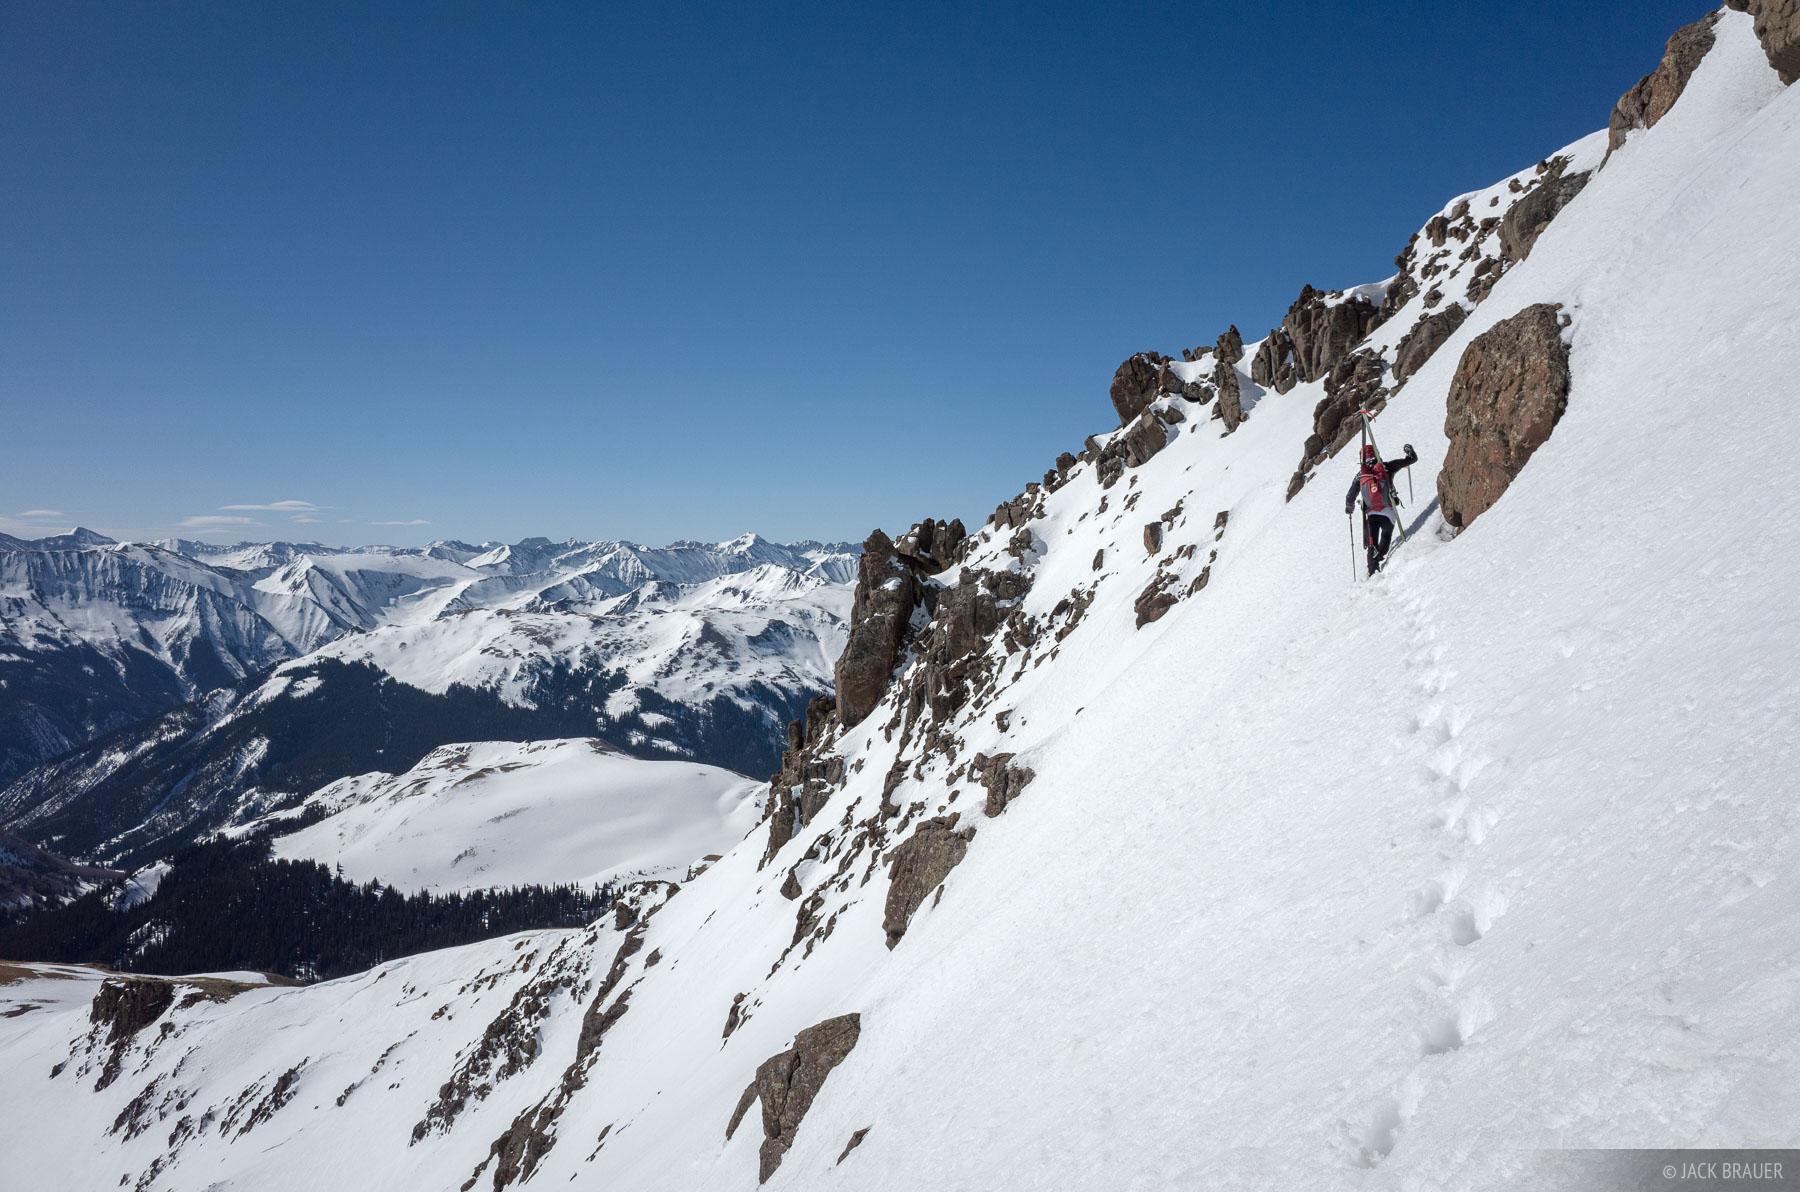 Colorado, San Juan Mountains, Uncompahgre Wilderness, Wetterhorn Peak, photo